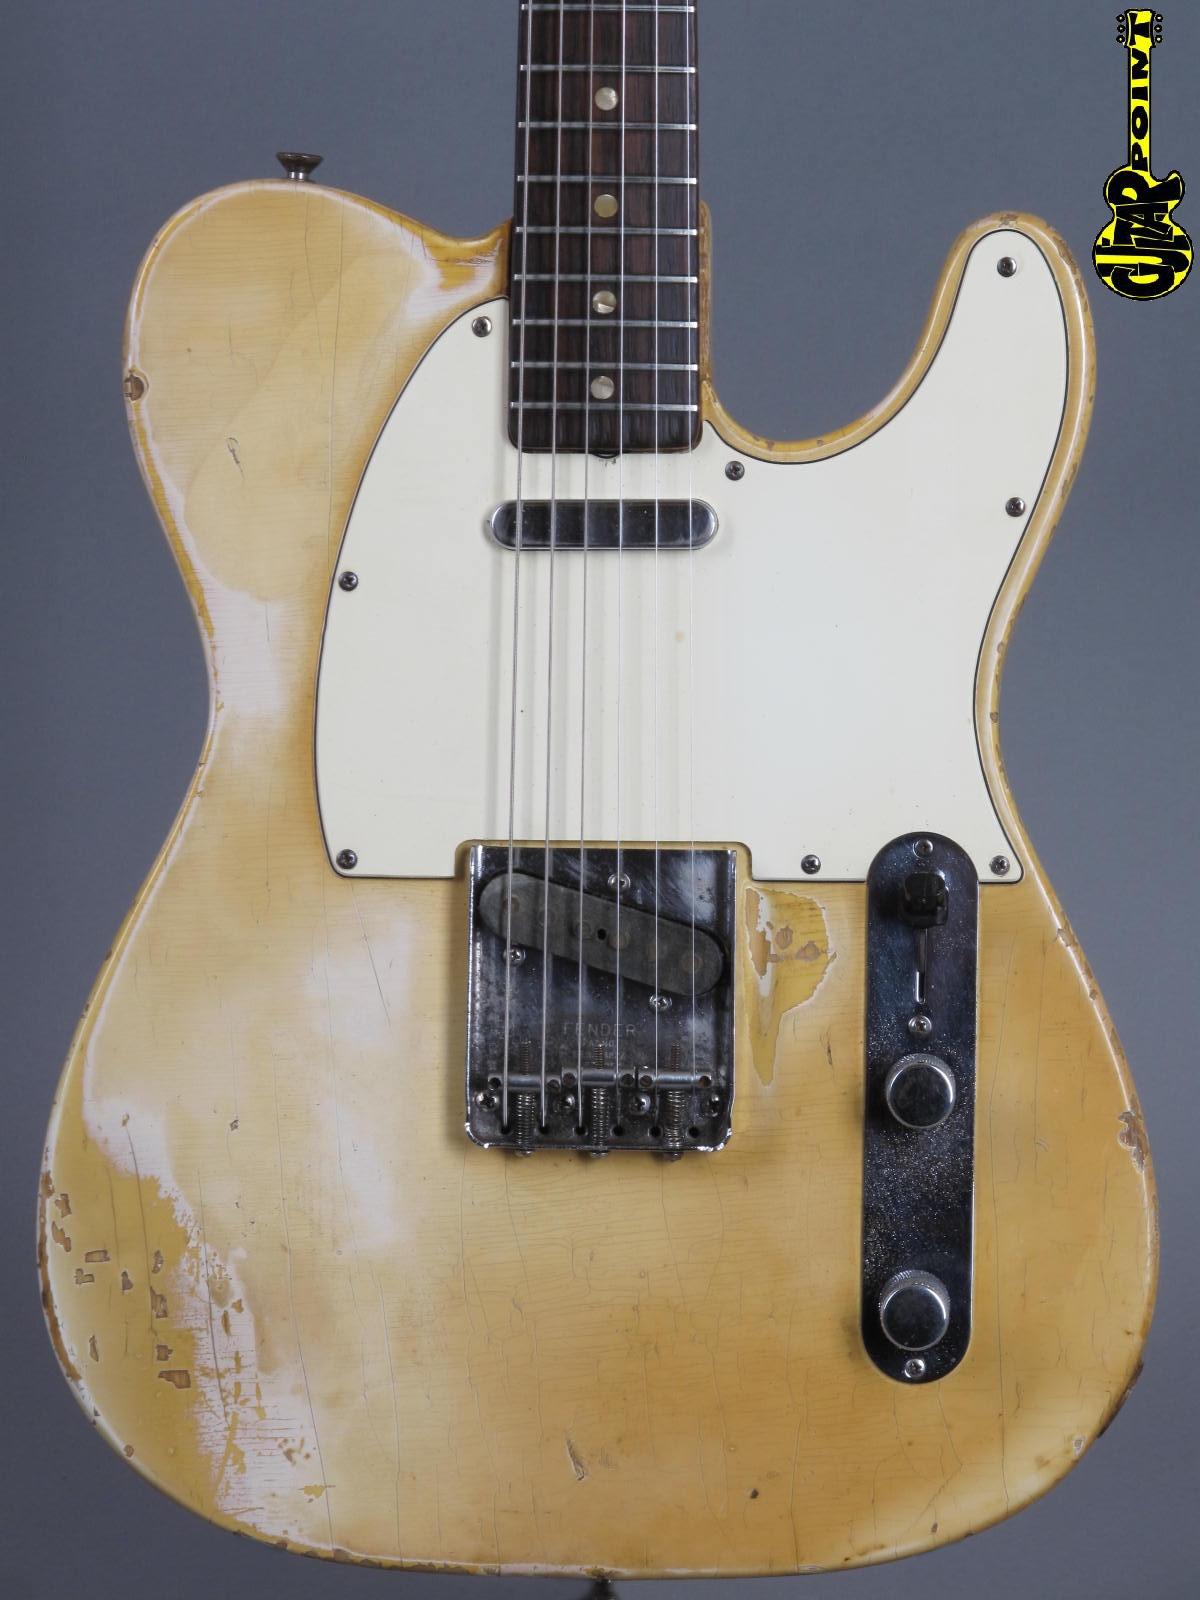 1970 Fender Telecaster -  Blond   ...lightweight = 3,19Kg!